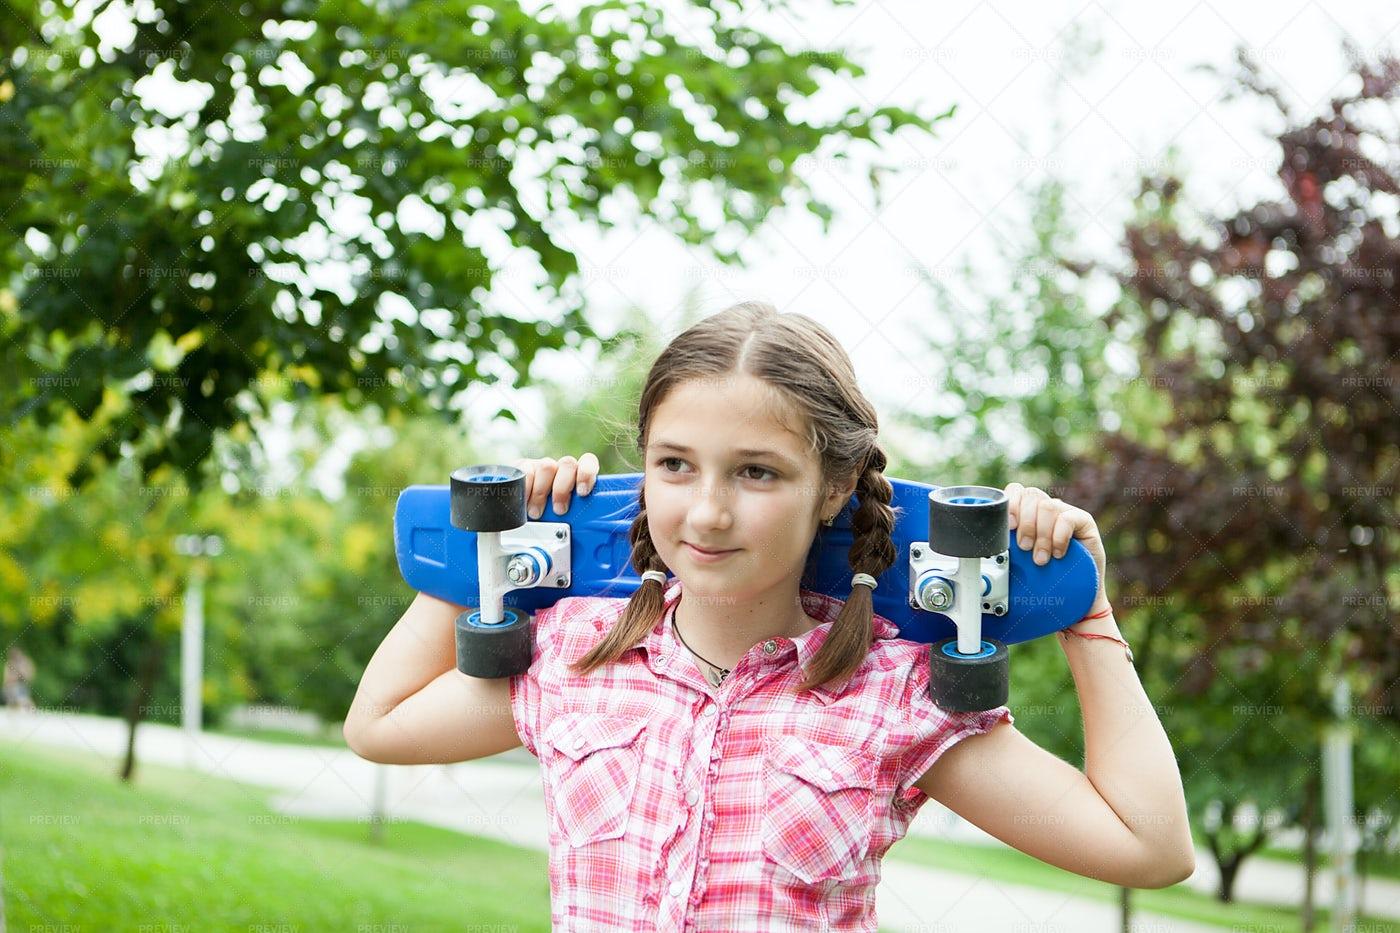 Skater Girl At The Park: Stock Photos